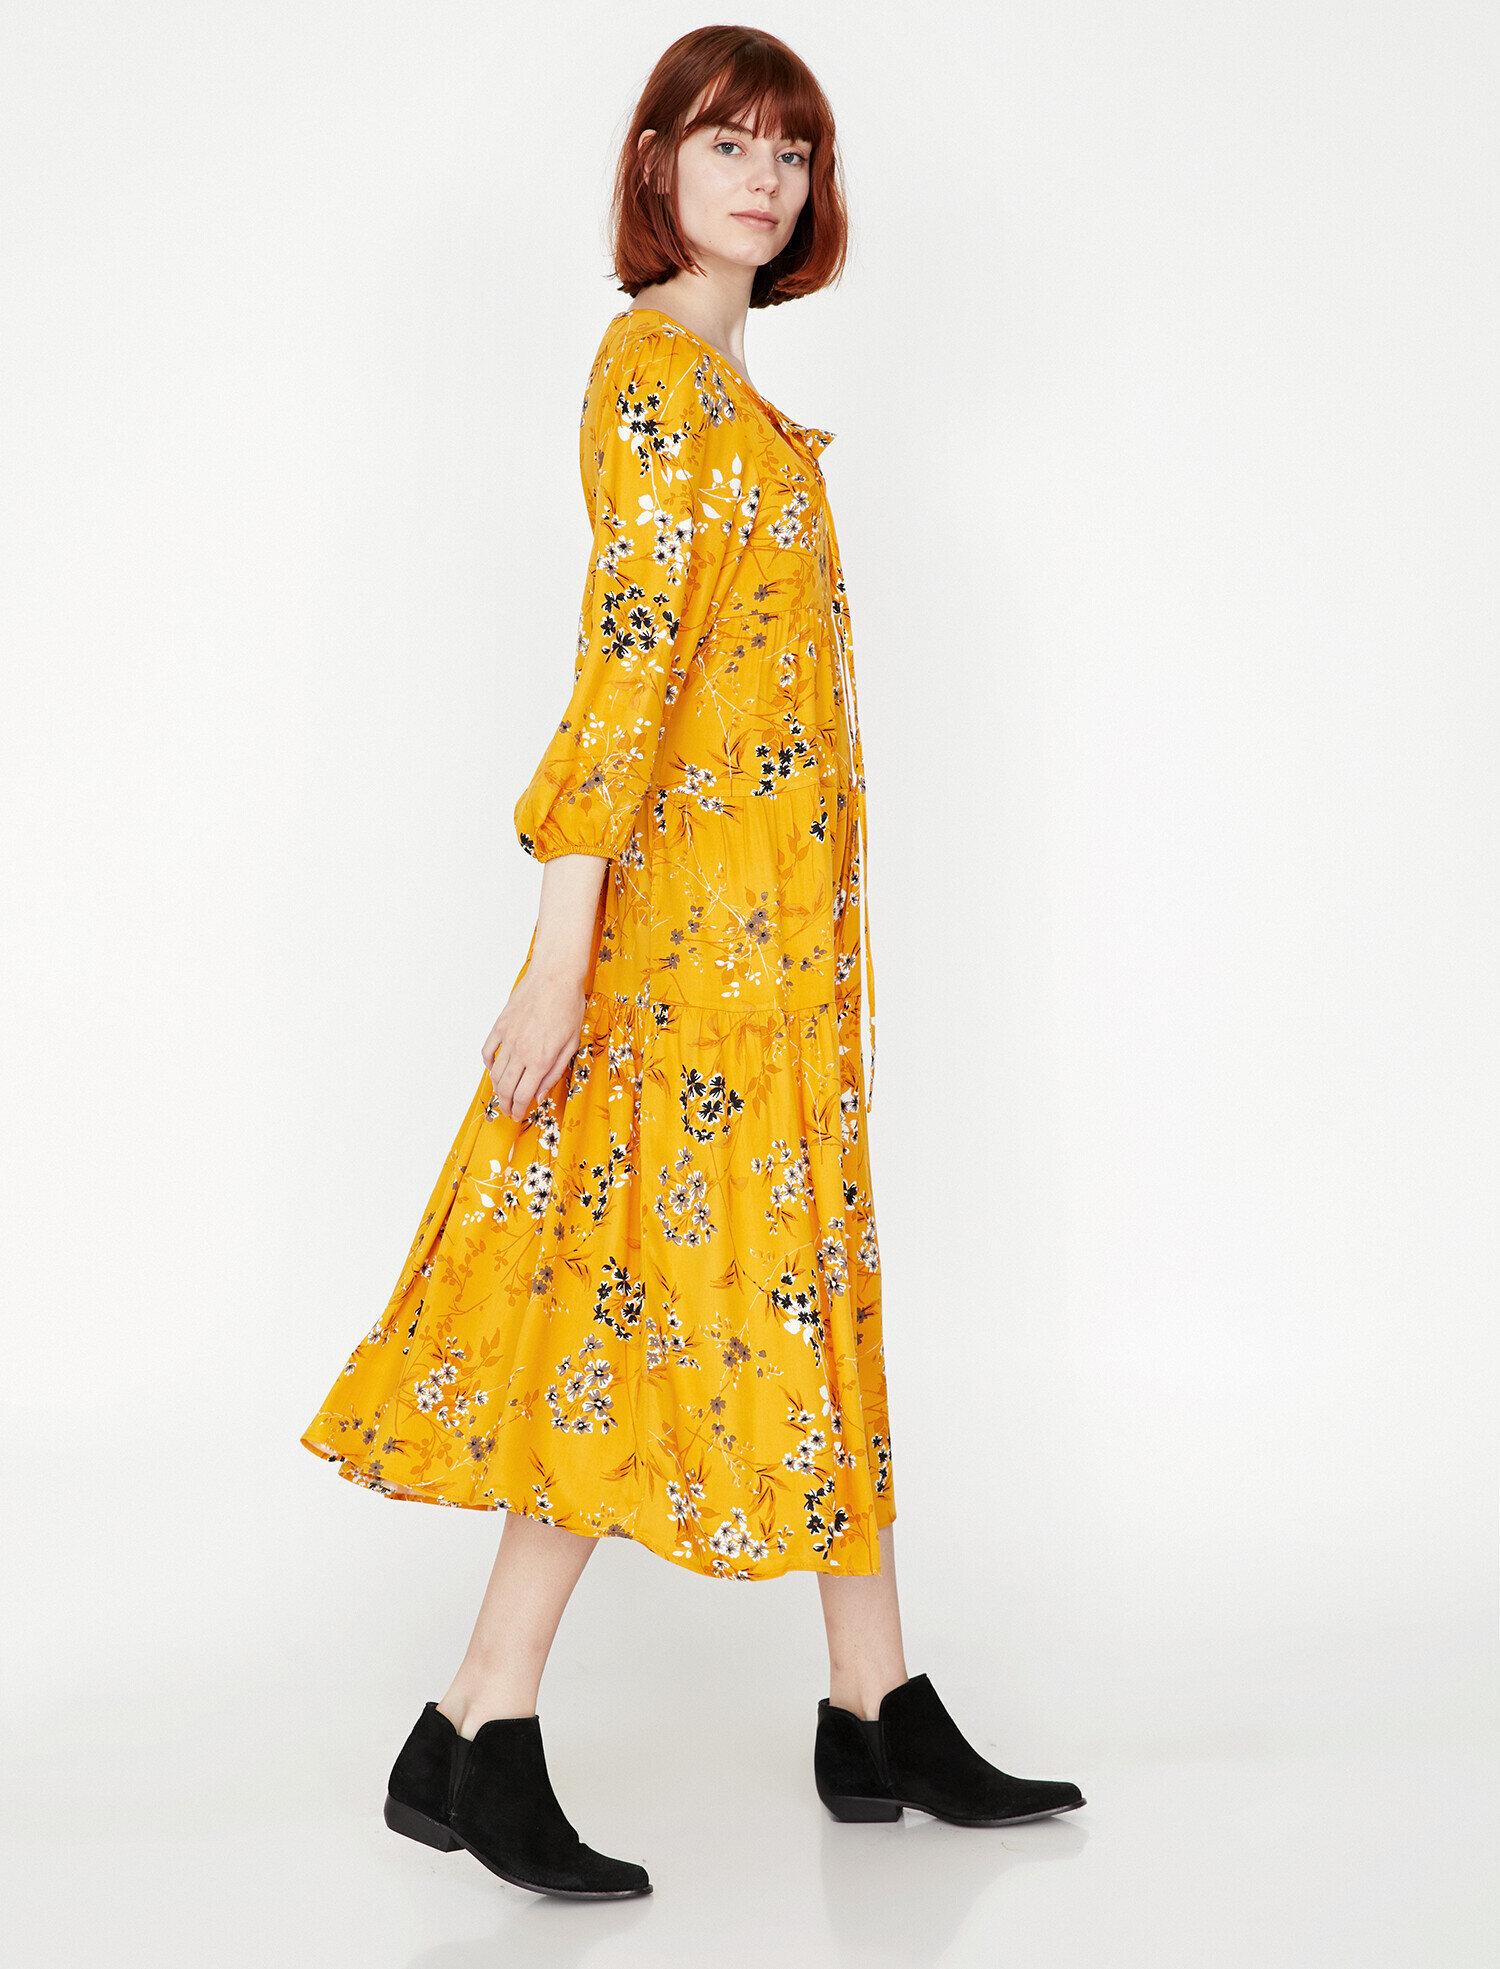 a28267a8d8659 Modalite - Koton Çiçek Desenli Elbise Sarı